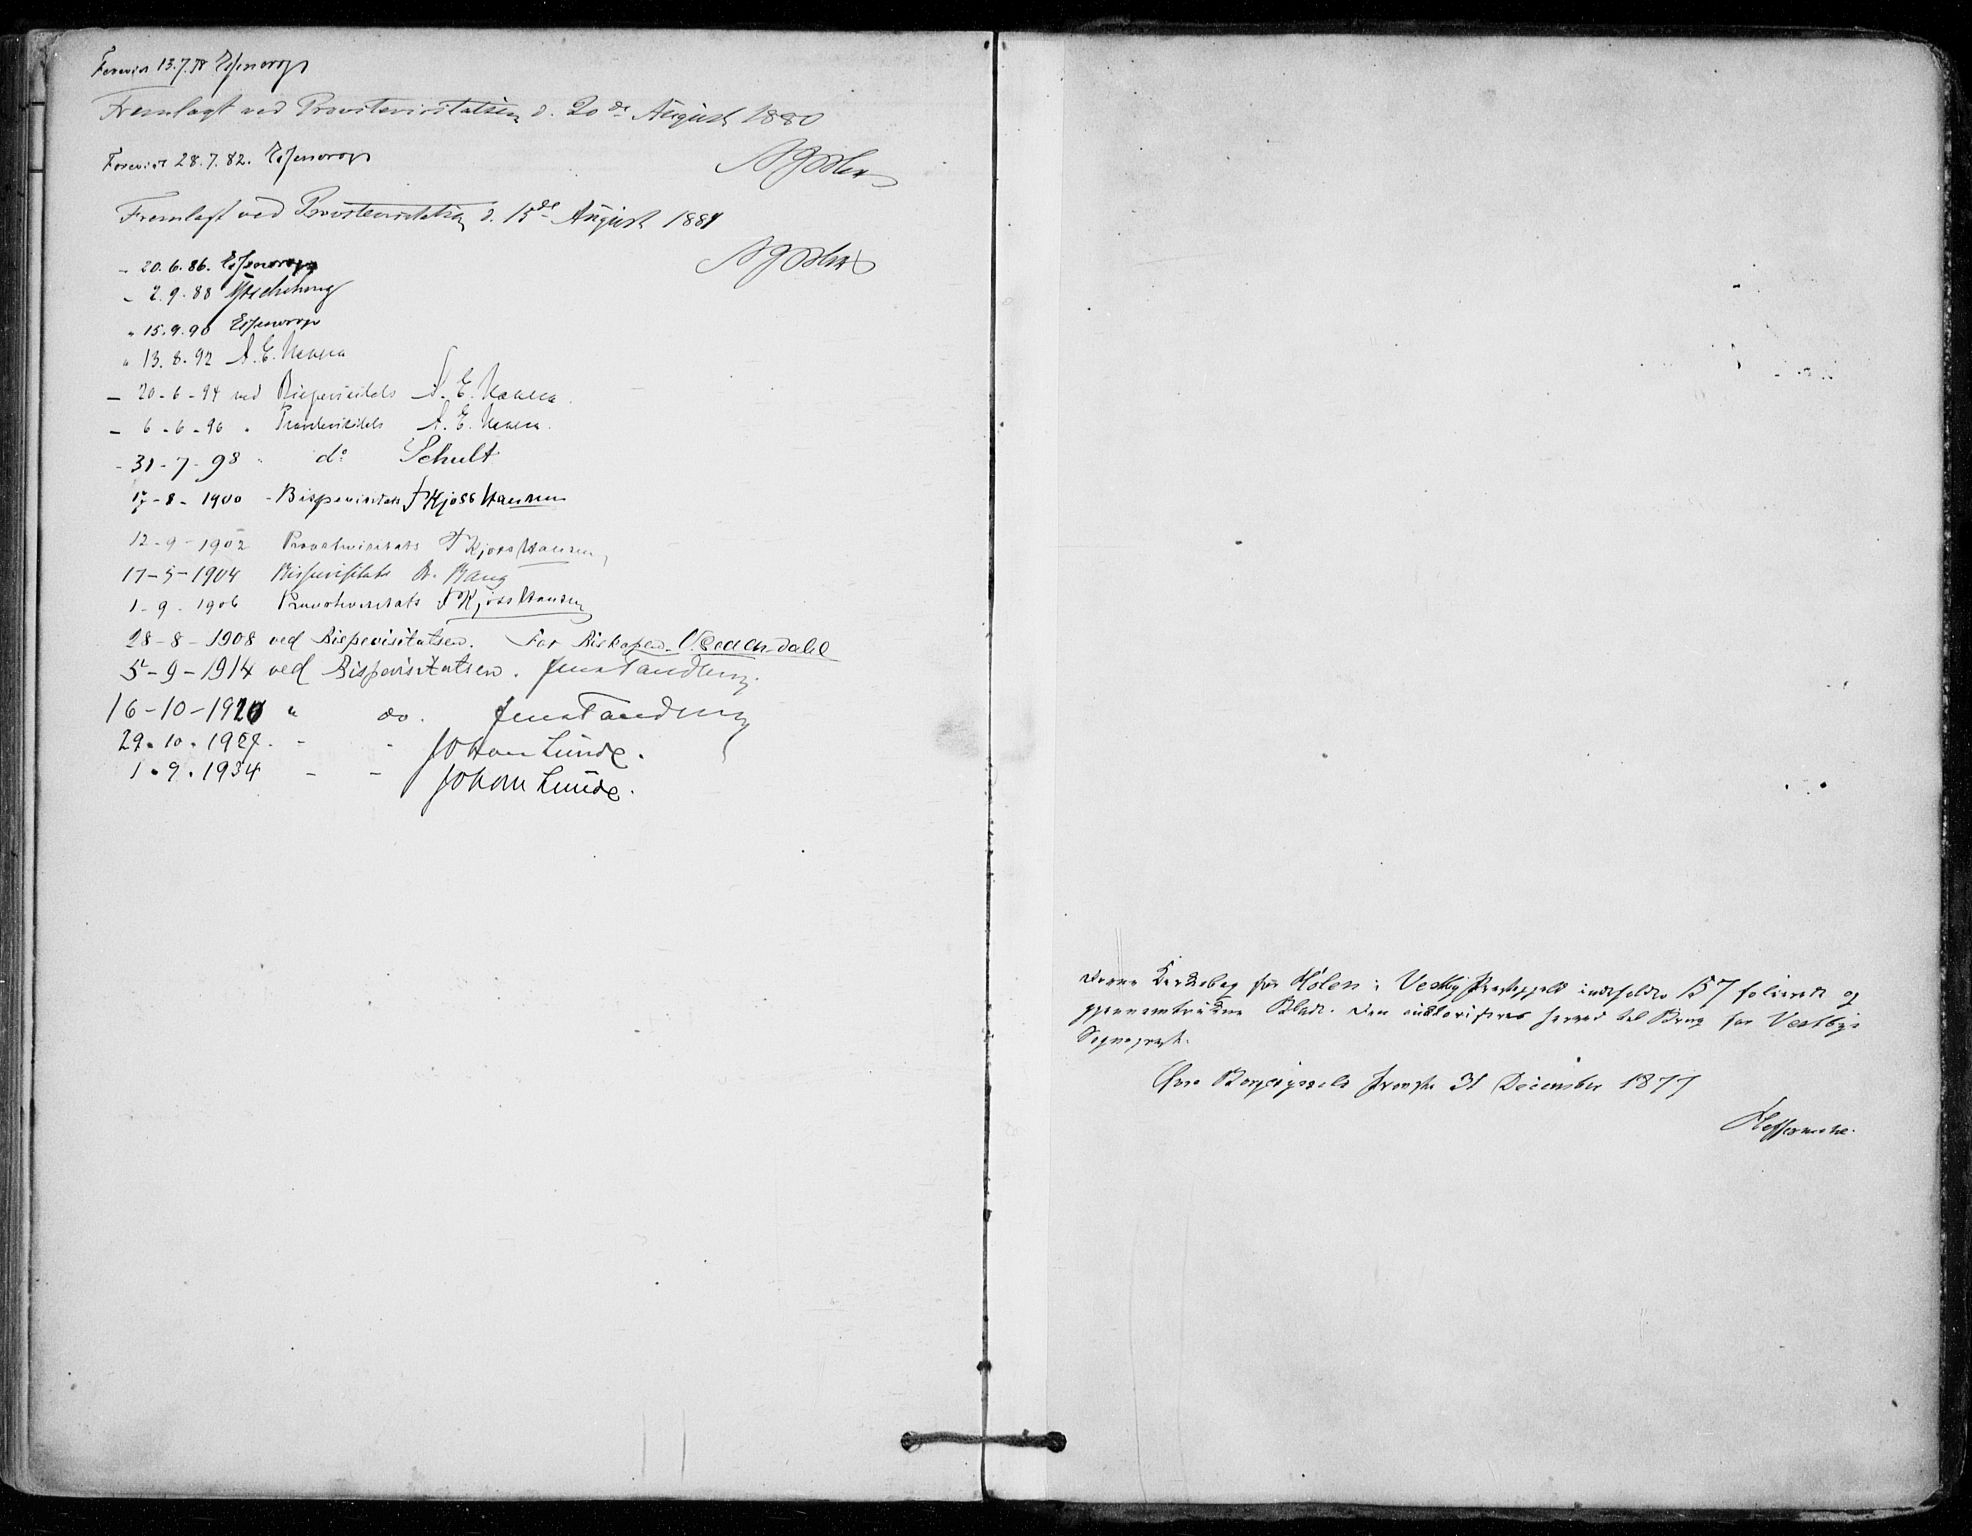 SAO, Vestby prestekontor Kirkebøker, F/Fe/L0001: Ministerialbok nr. V 1, 1878-1931